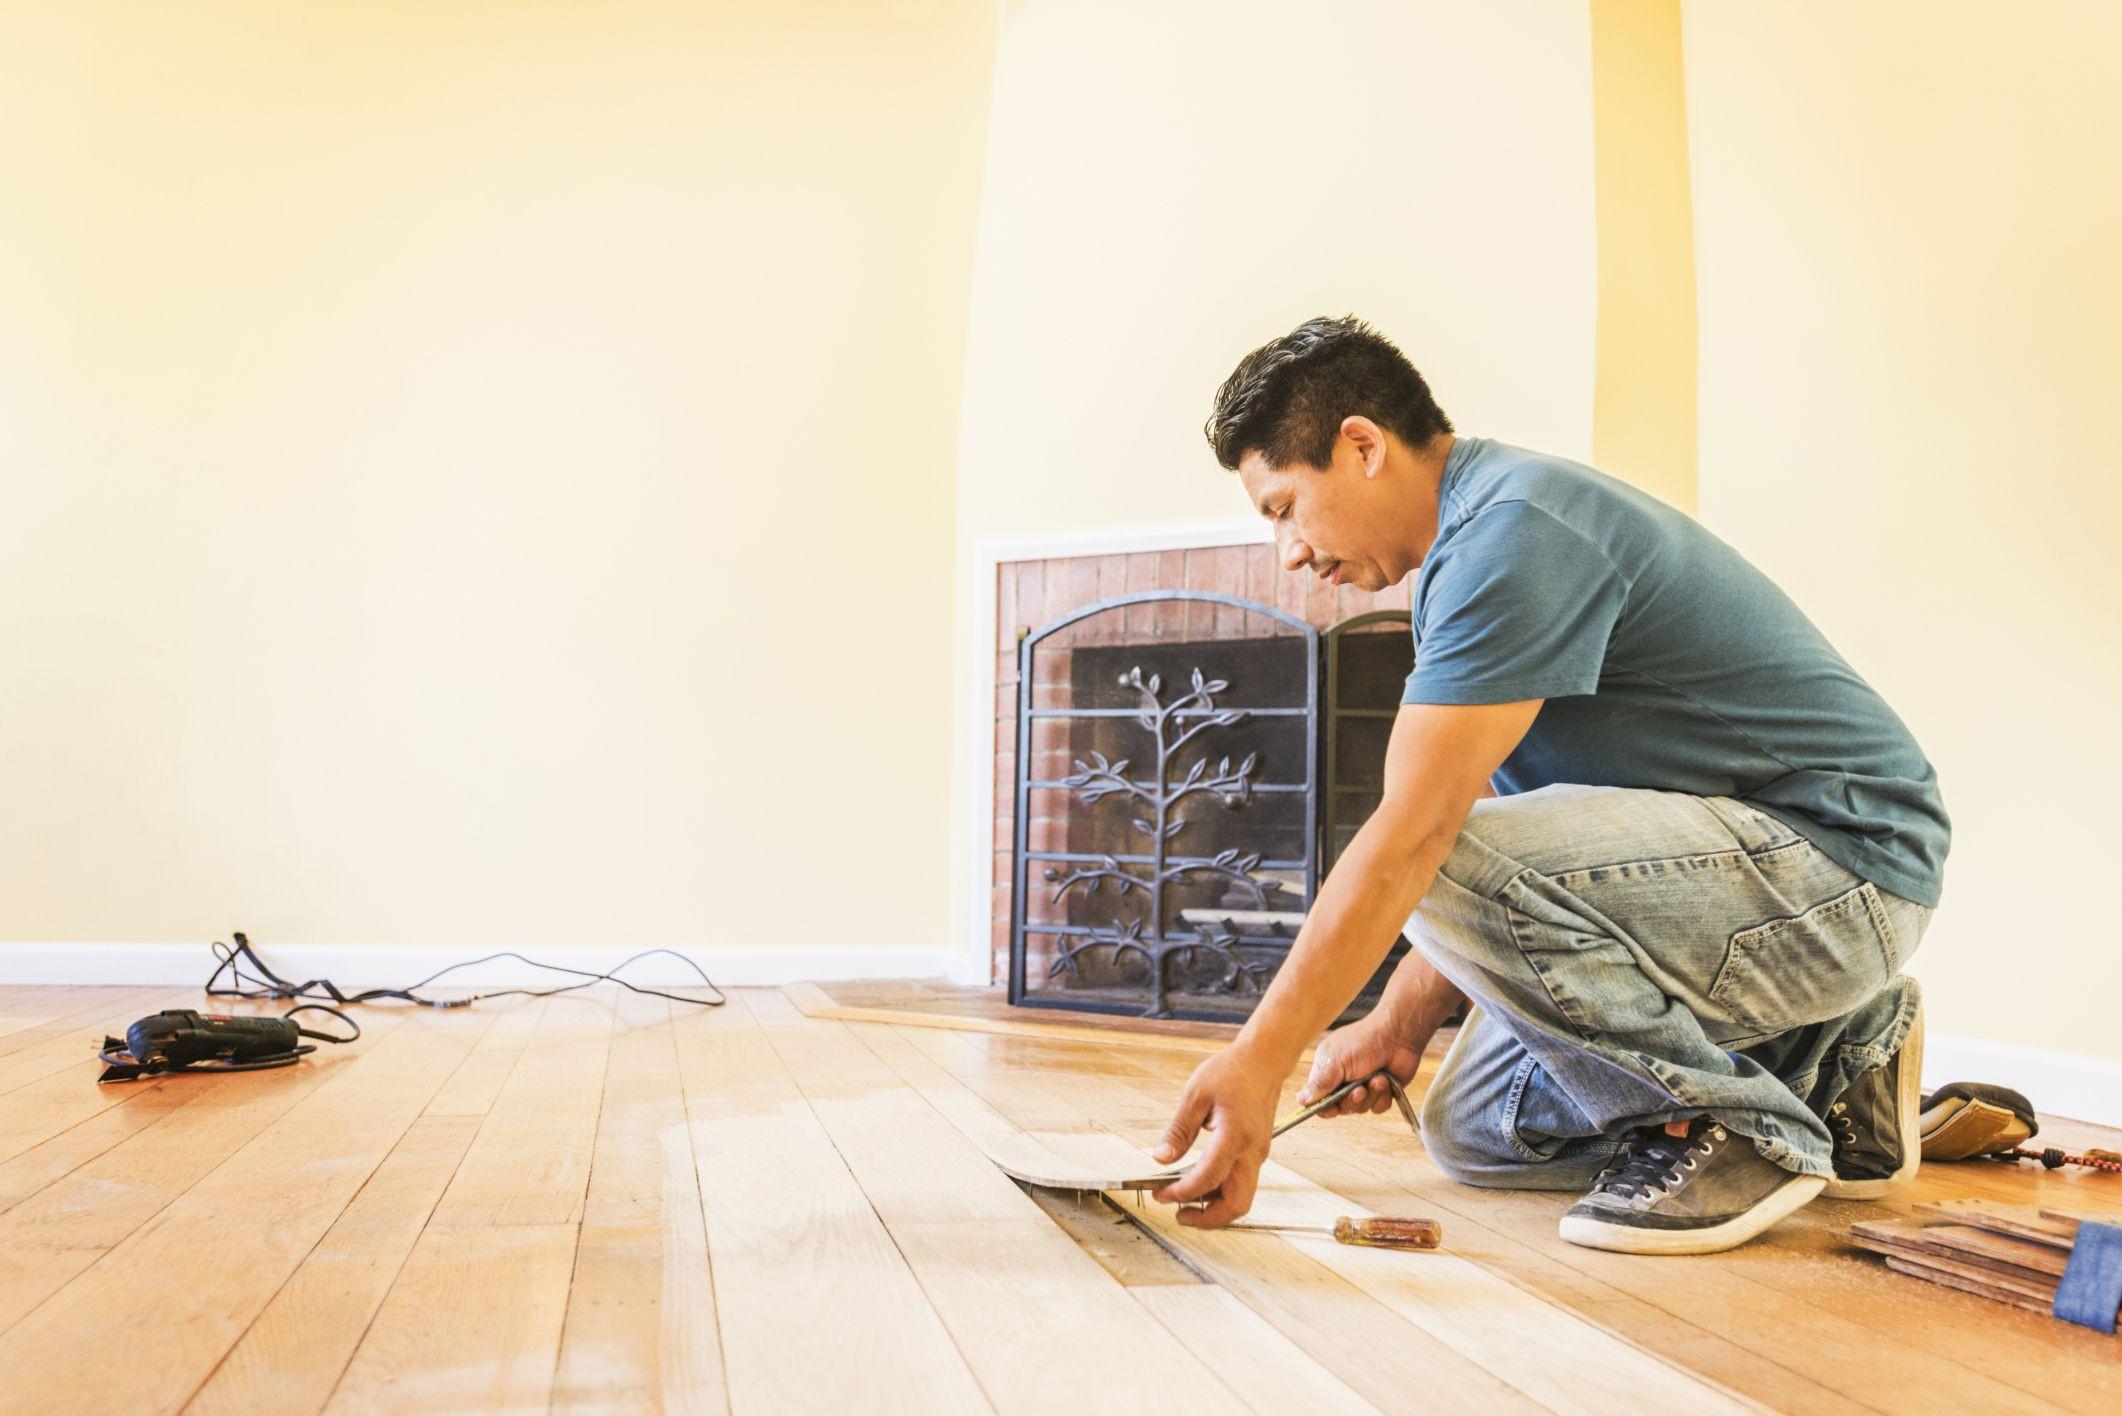 birch hand scraped hardwood flooring of solid hardwood flooring costs for professional vs diy pertaining to installwoodflooring 592016327 56684d6f3df78ce1610a598a